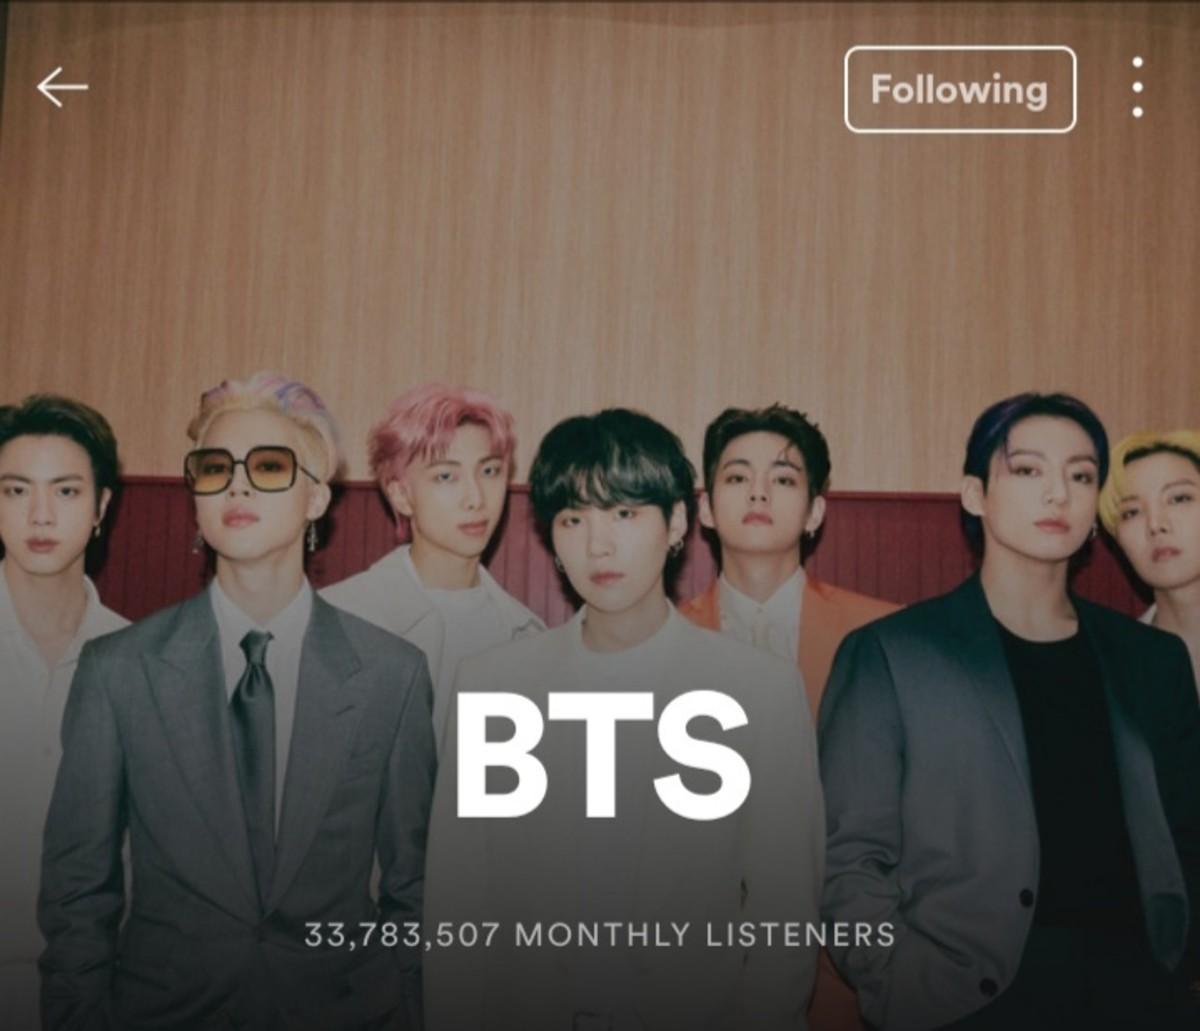 BTS Spotify